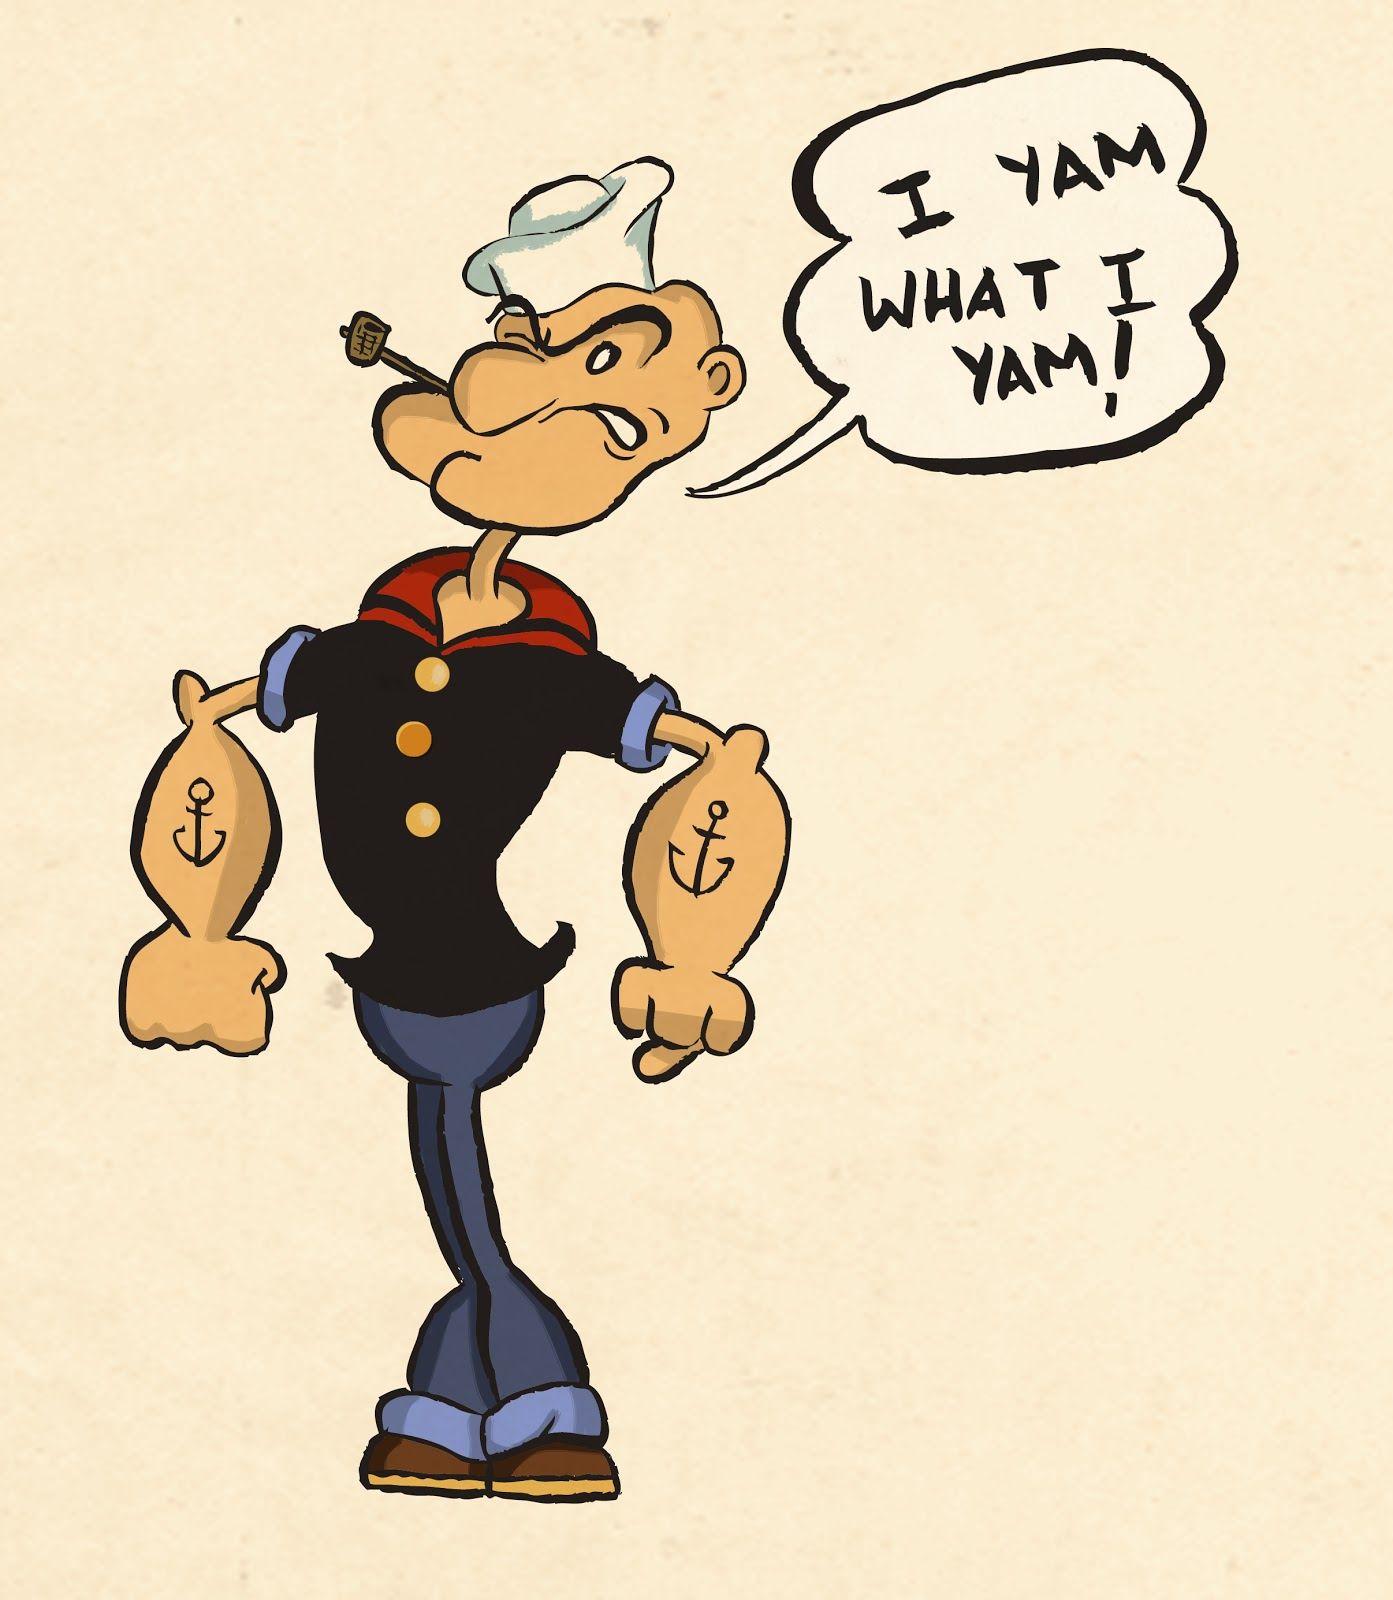 Popeye the Sailor Man Wallpapers Popeye the sailor man Popeye 1393x1600